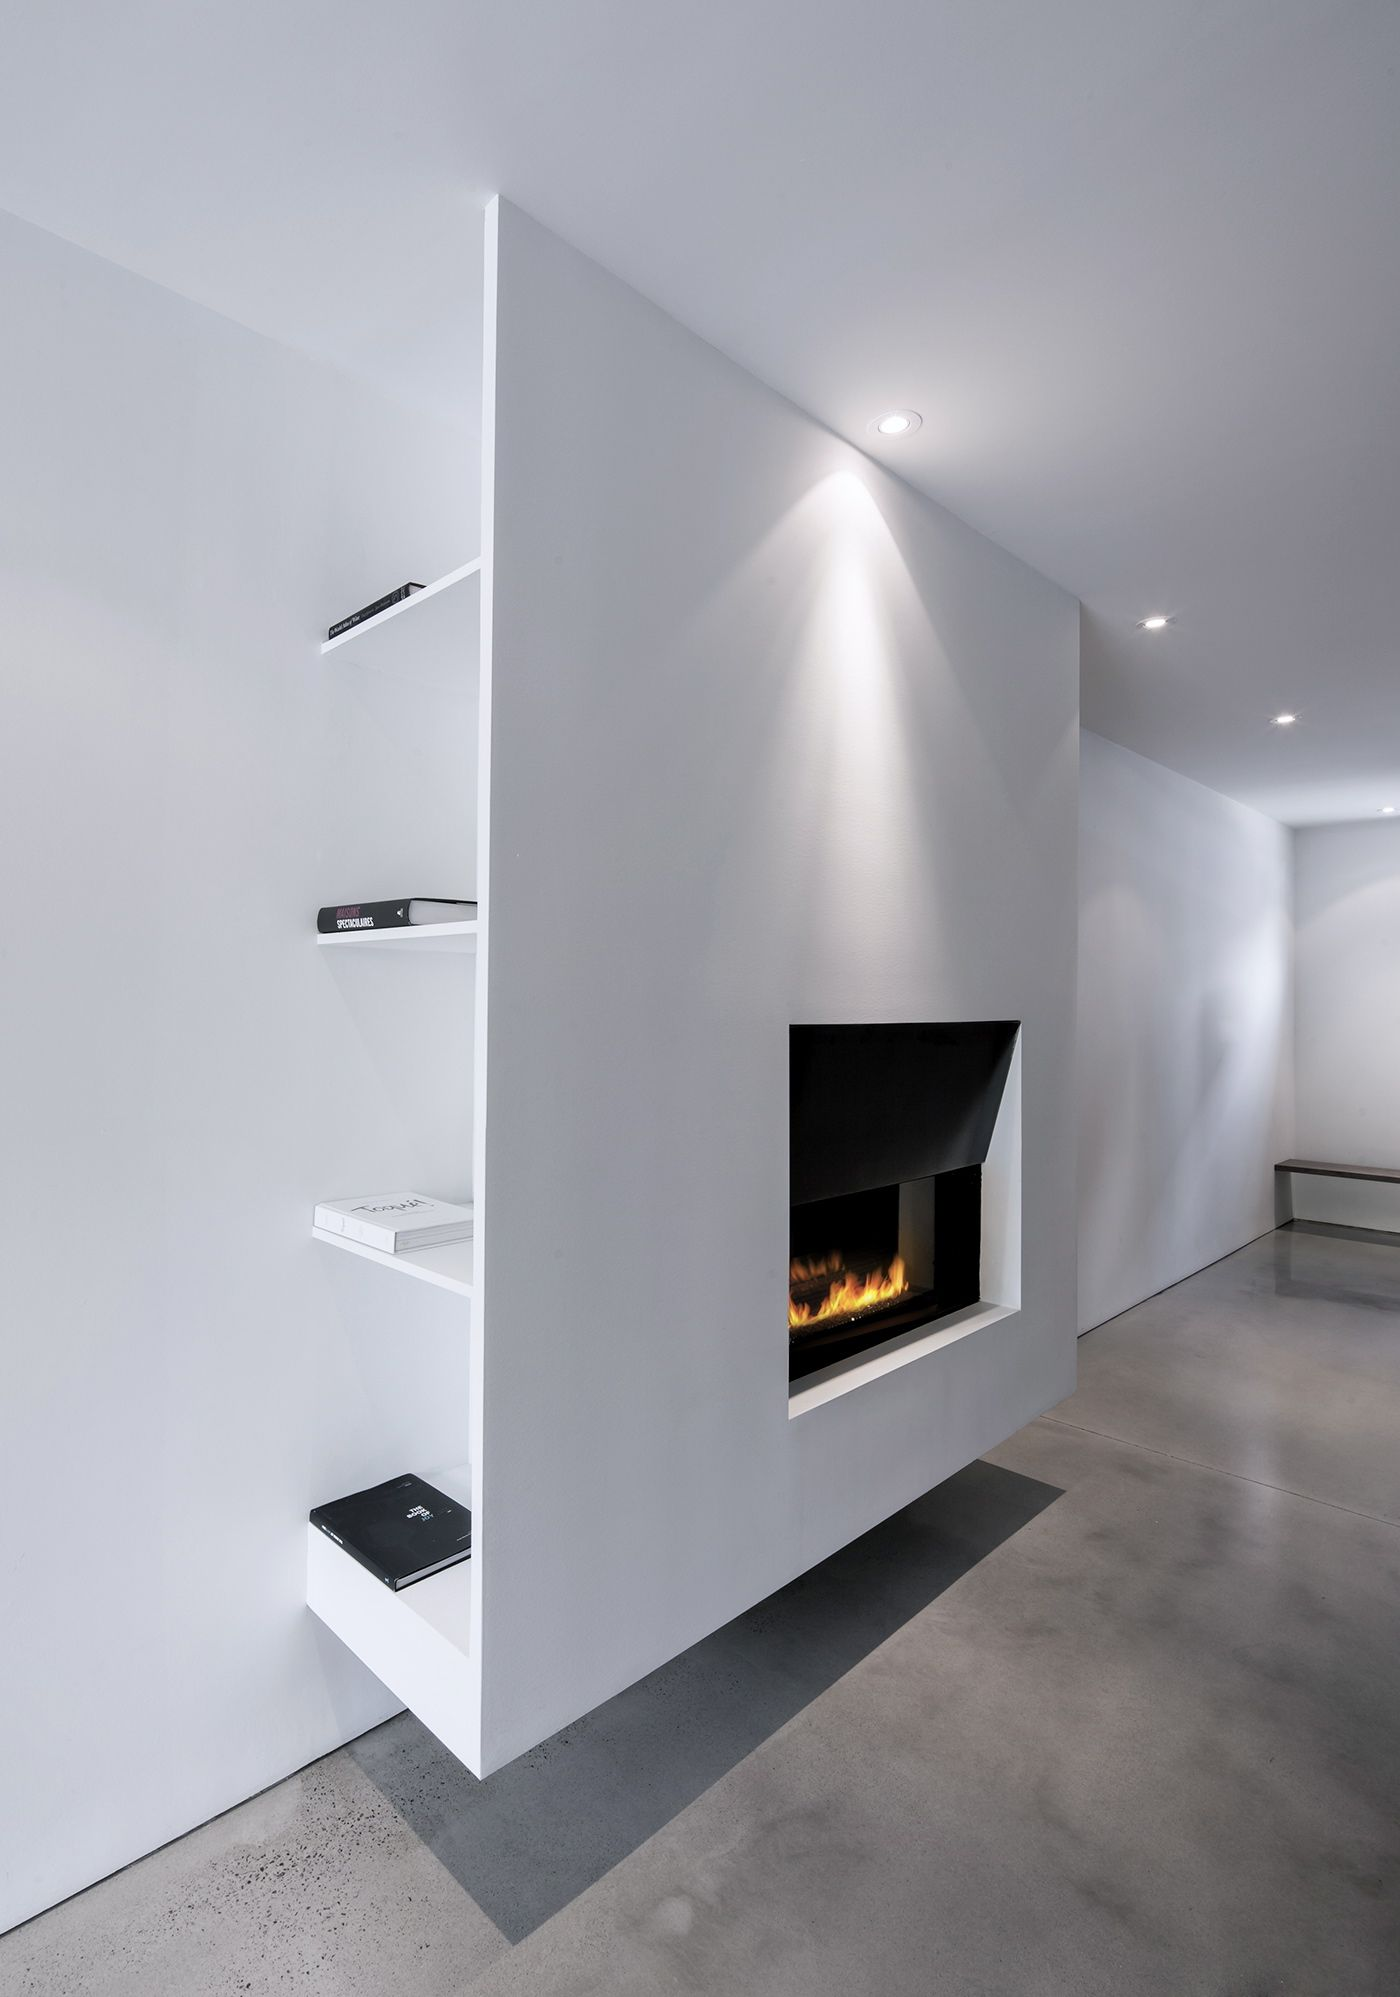 Spot etagere derri re meuble et fa ade suspendue Meuble tv cheminee